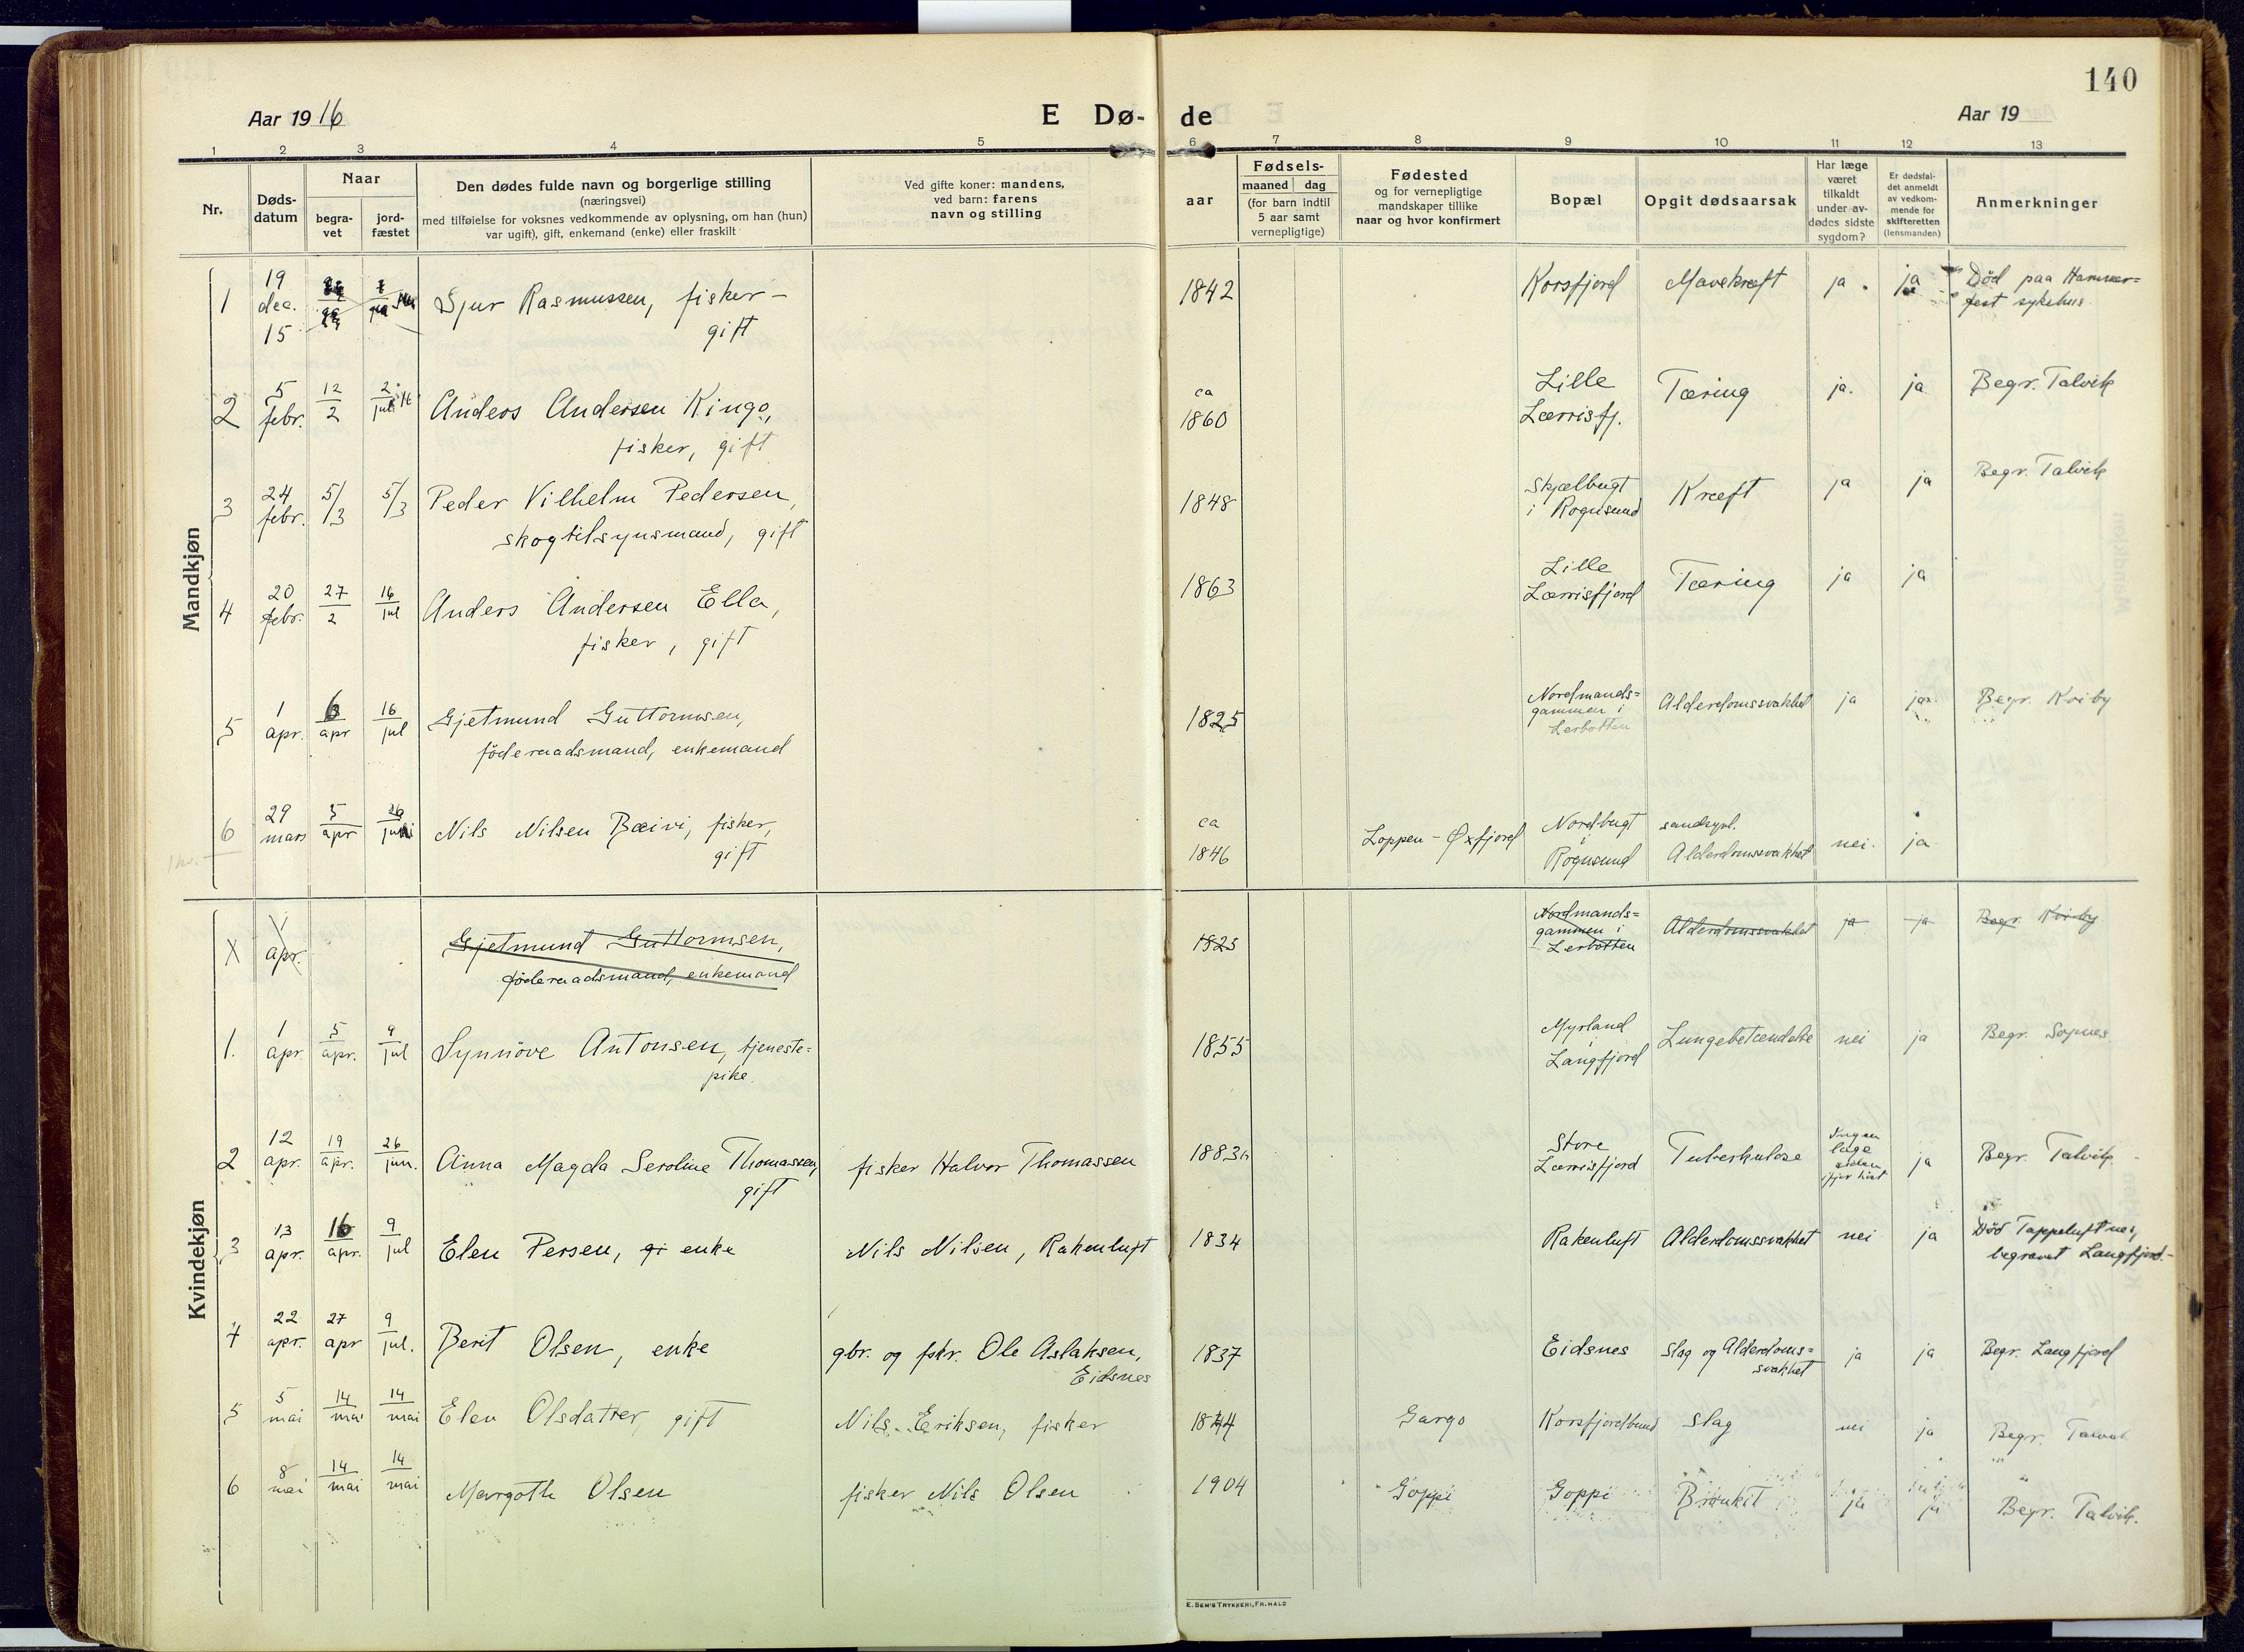 SATØ, Talvik sokneprestkontor, H/Ha/L0018kirke: Ministerialbok nr. 18, 1915-1924, s. 140